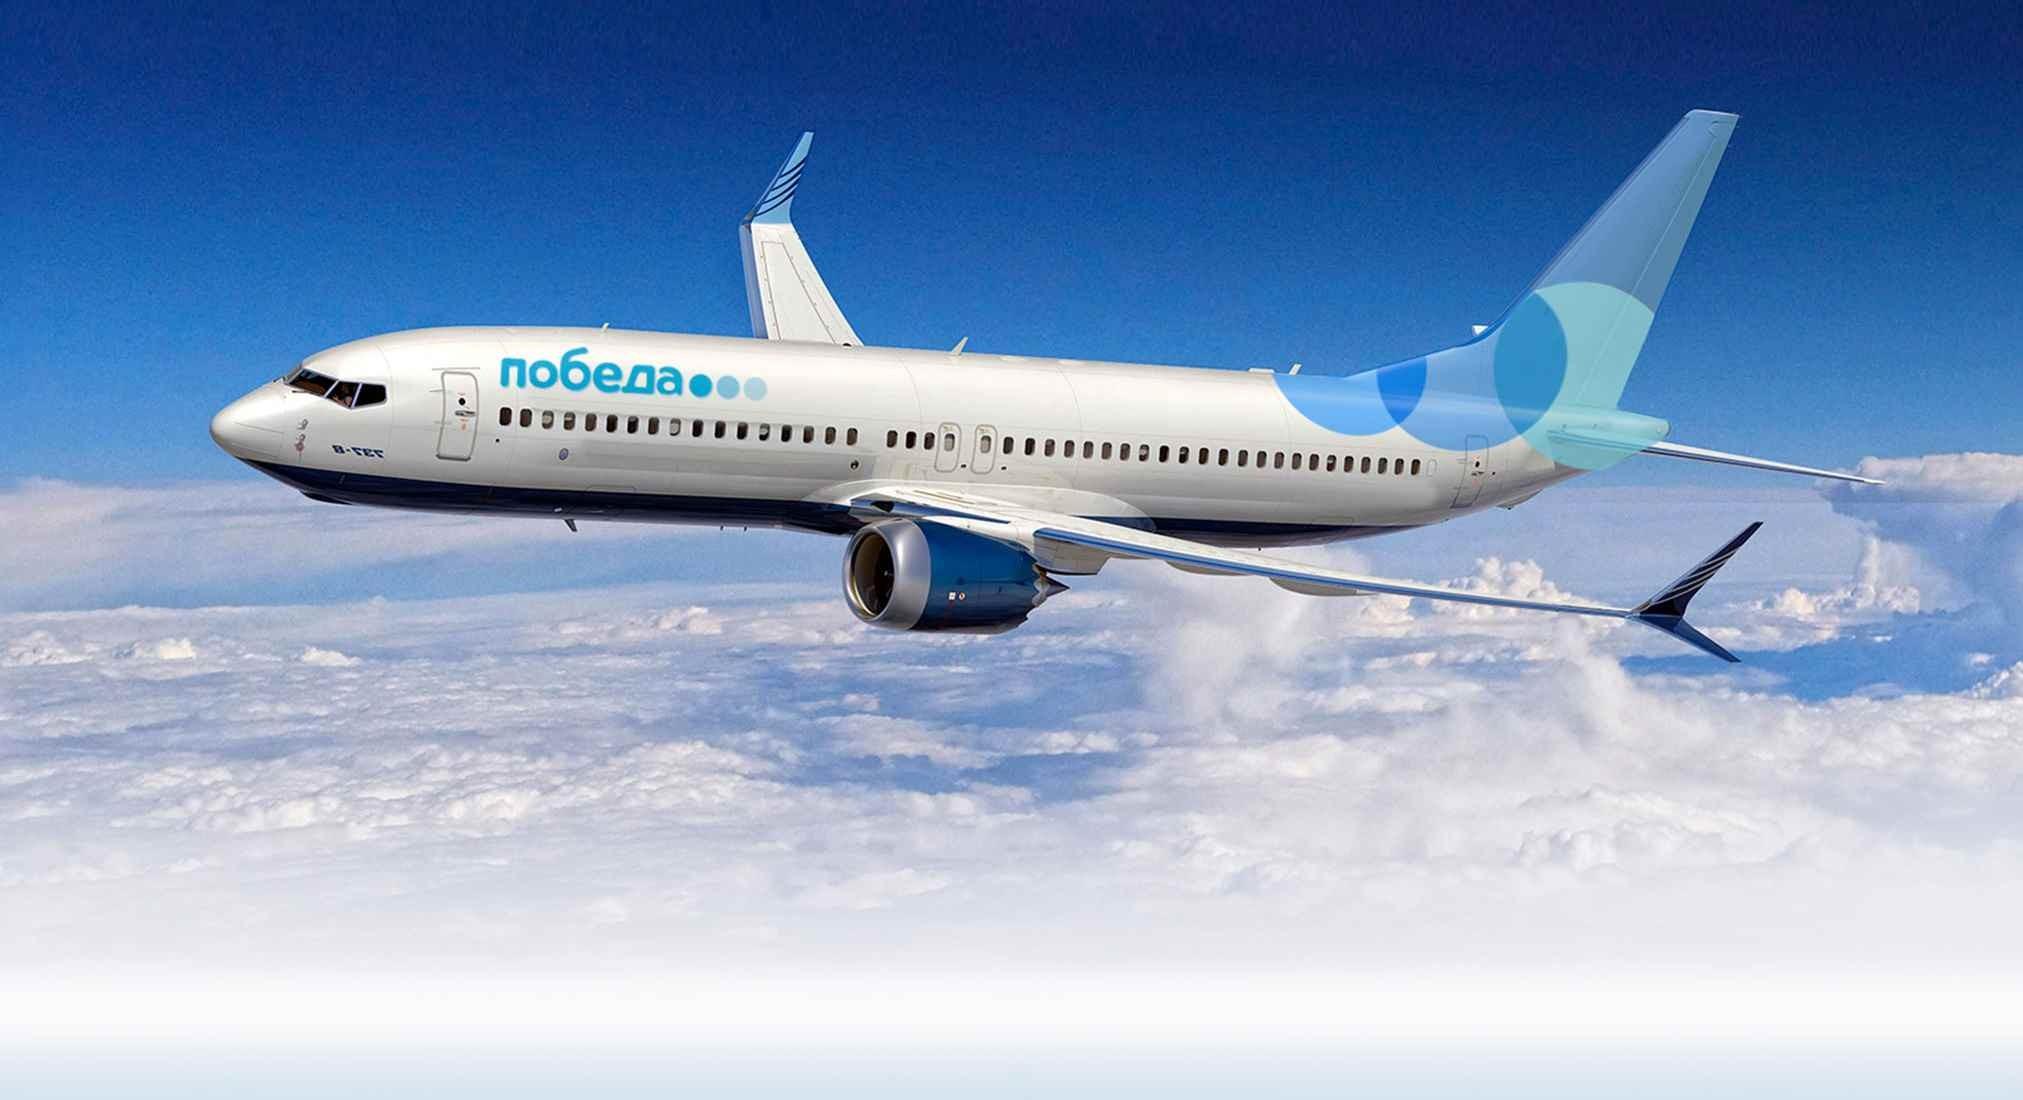 Акция победа авиабилеты 1 рубль билеты на самолет волгоград-китай